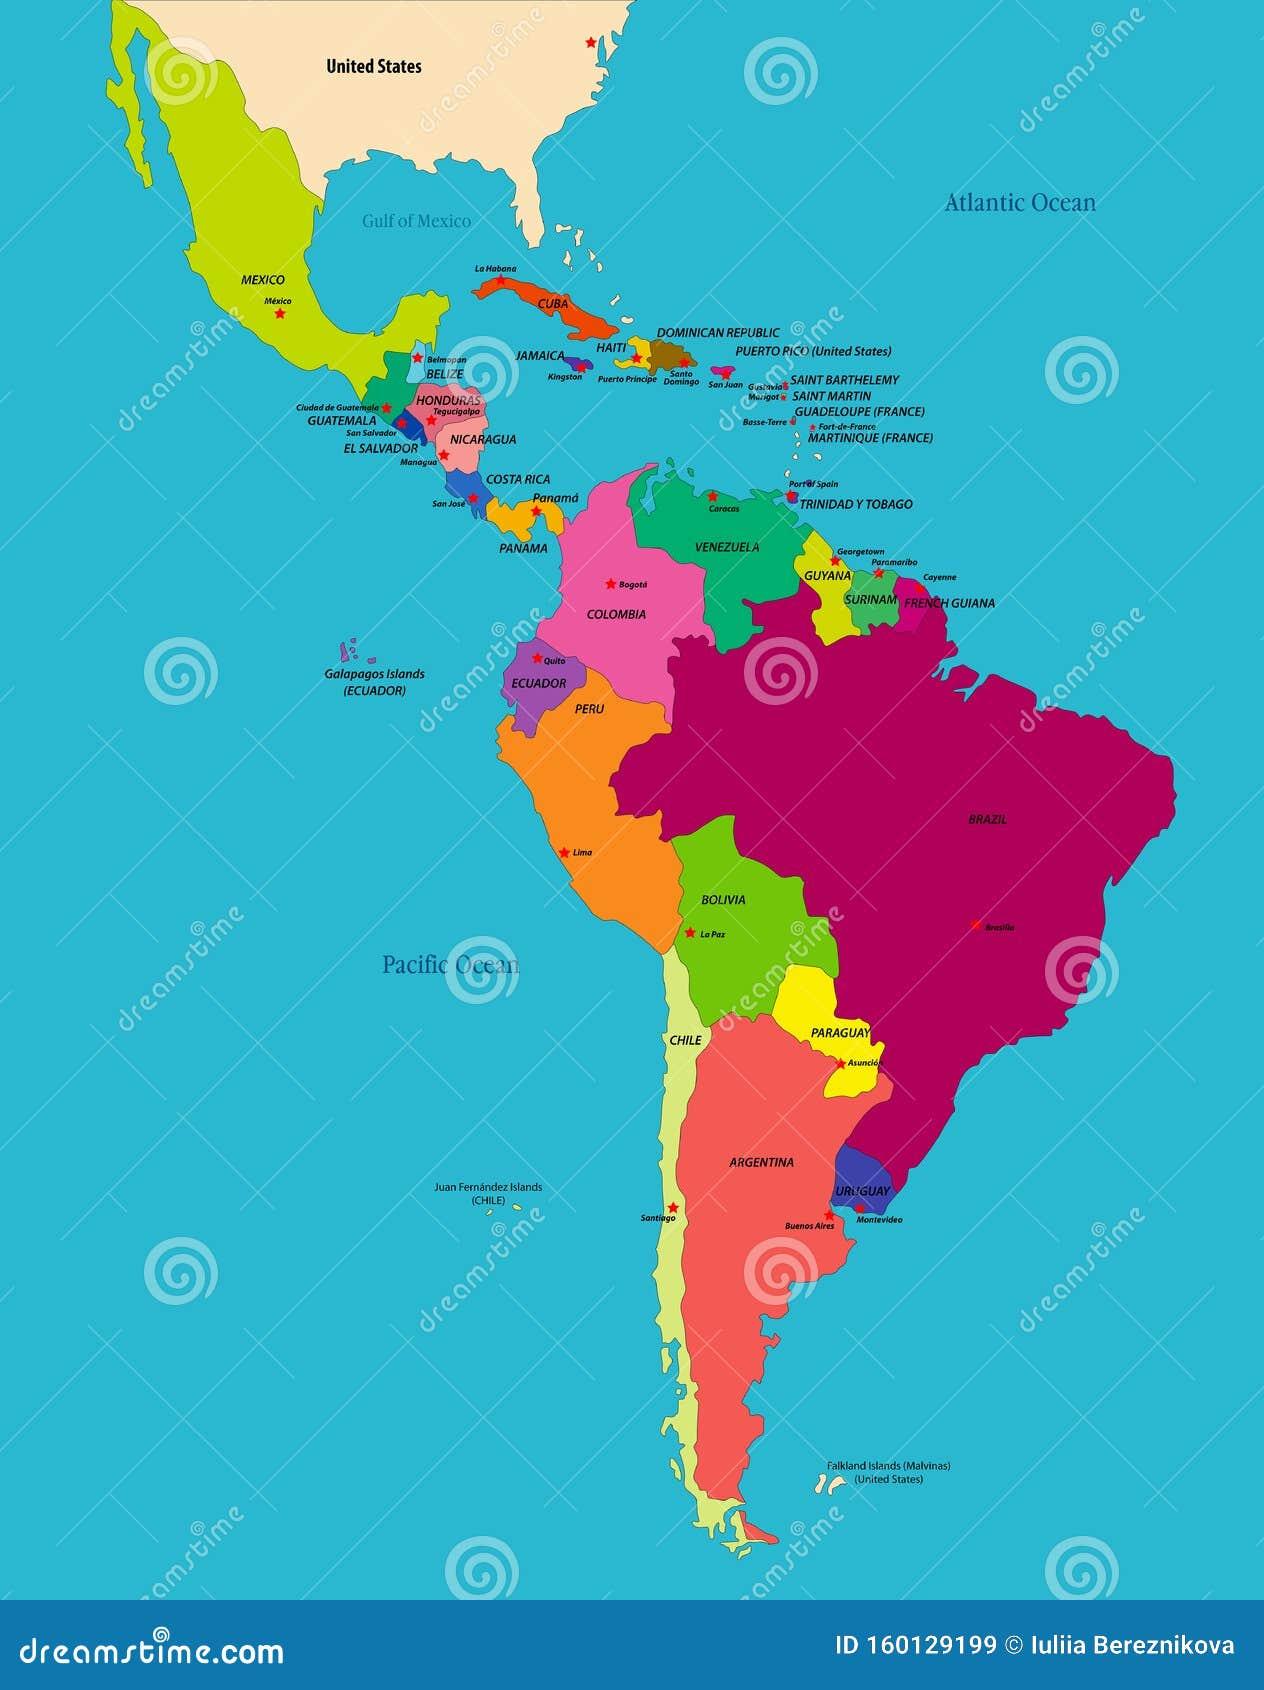 America Politica Cartina.Vector Political Map Of Latin America Stock Vector Illustration Of Capital Colorful 160129199